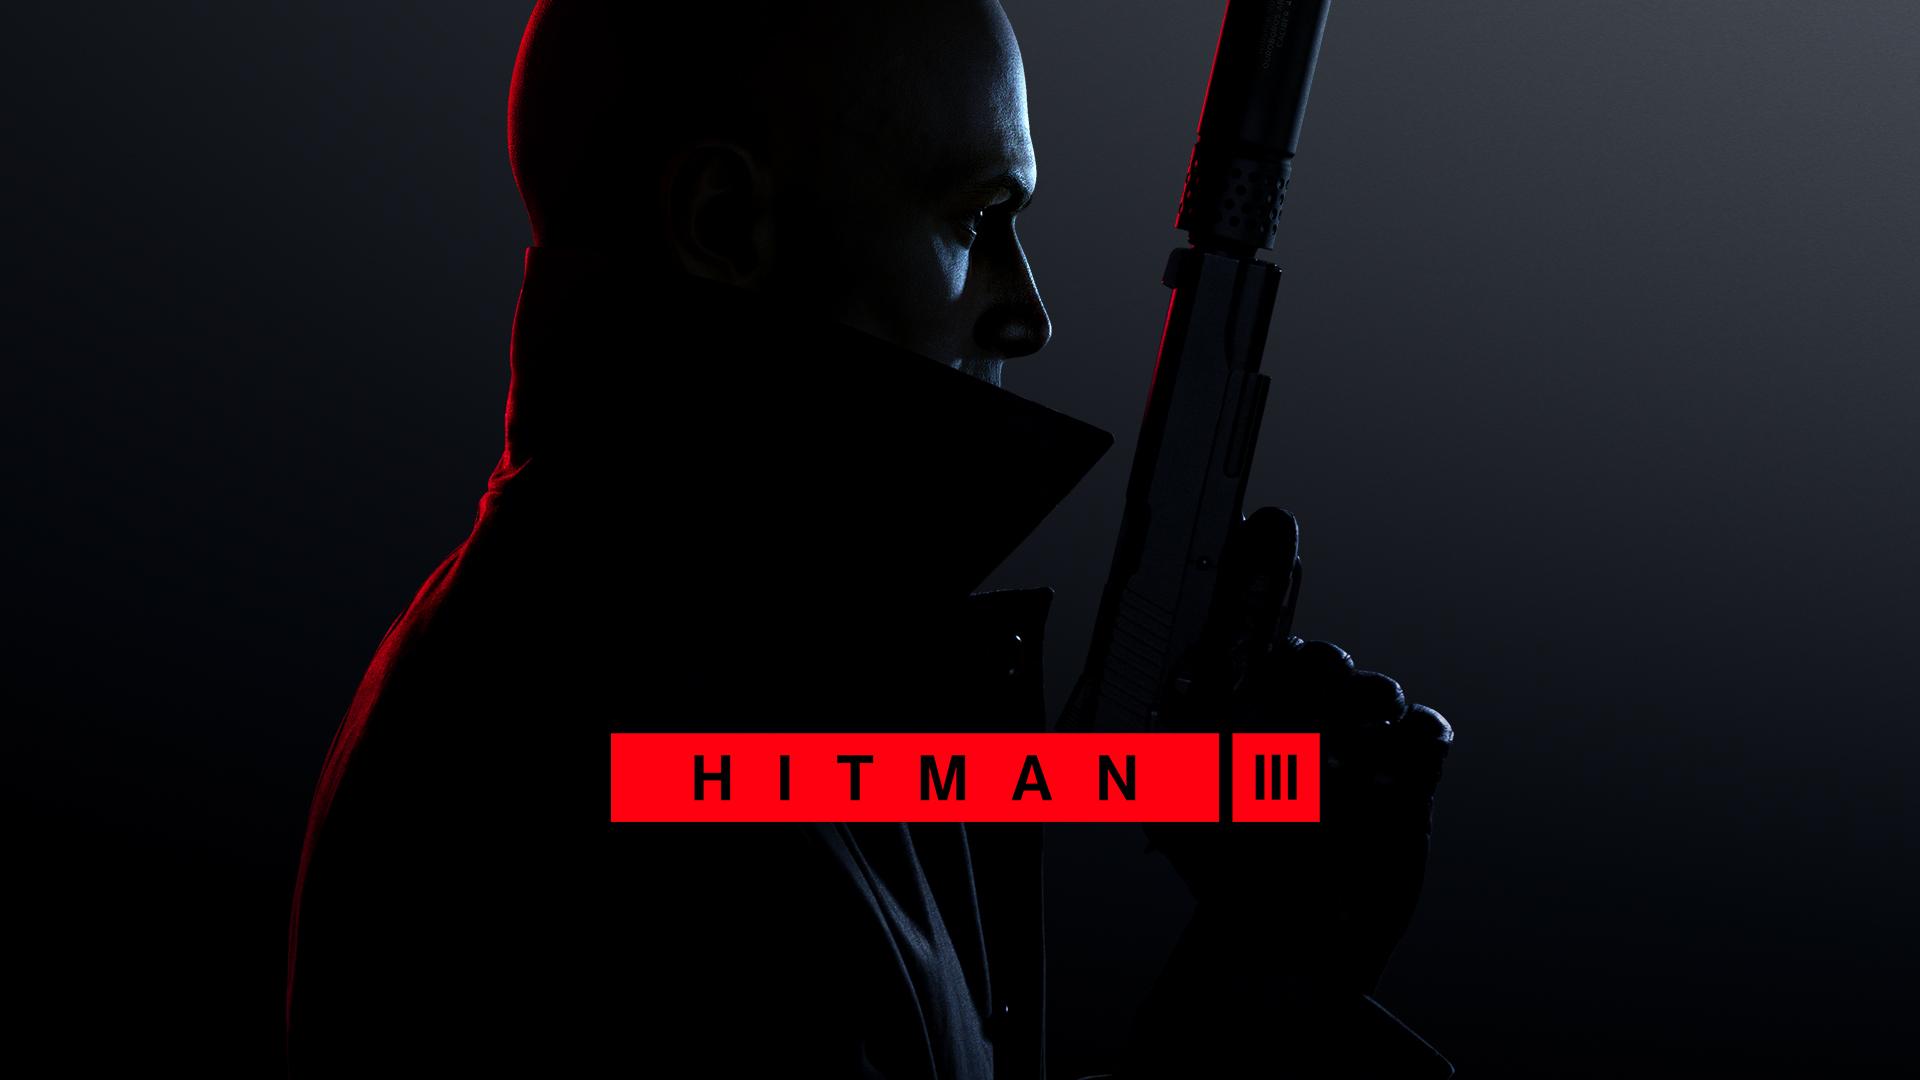 Cand se va lansa Hitman 3